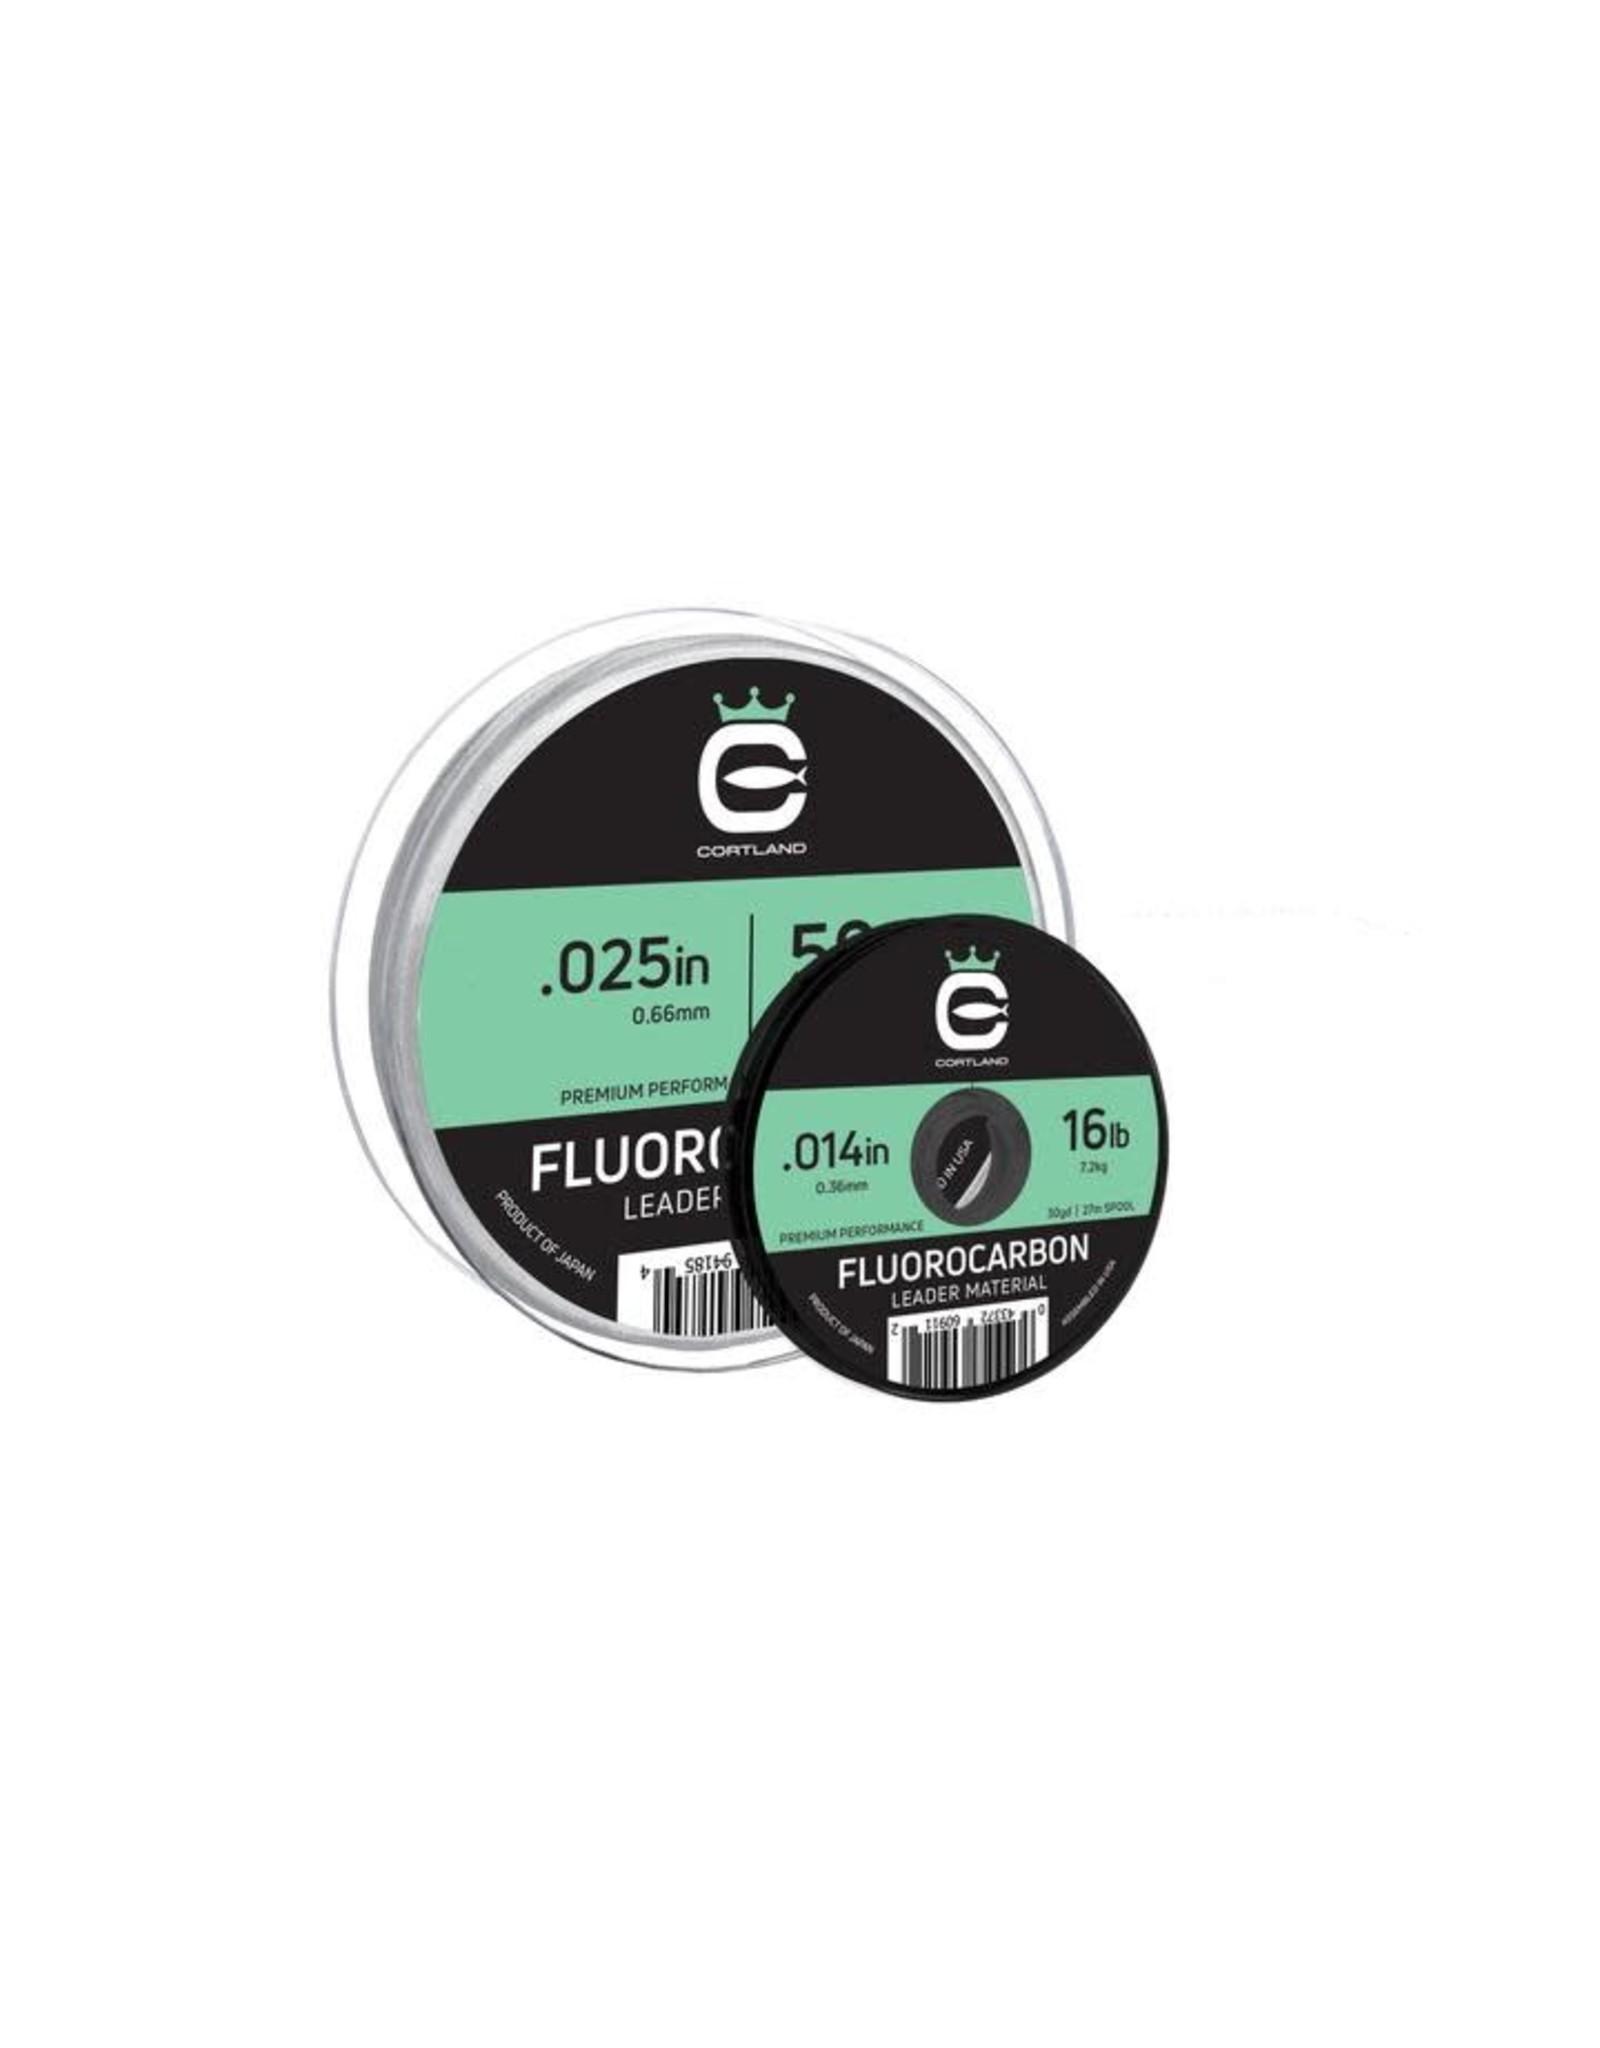 Cortland Line Cortland Fluorocarbon Leader Material 30yds